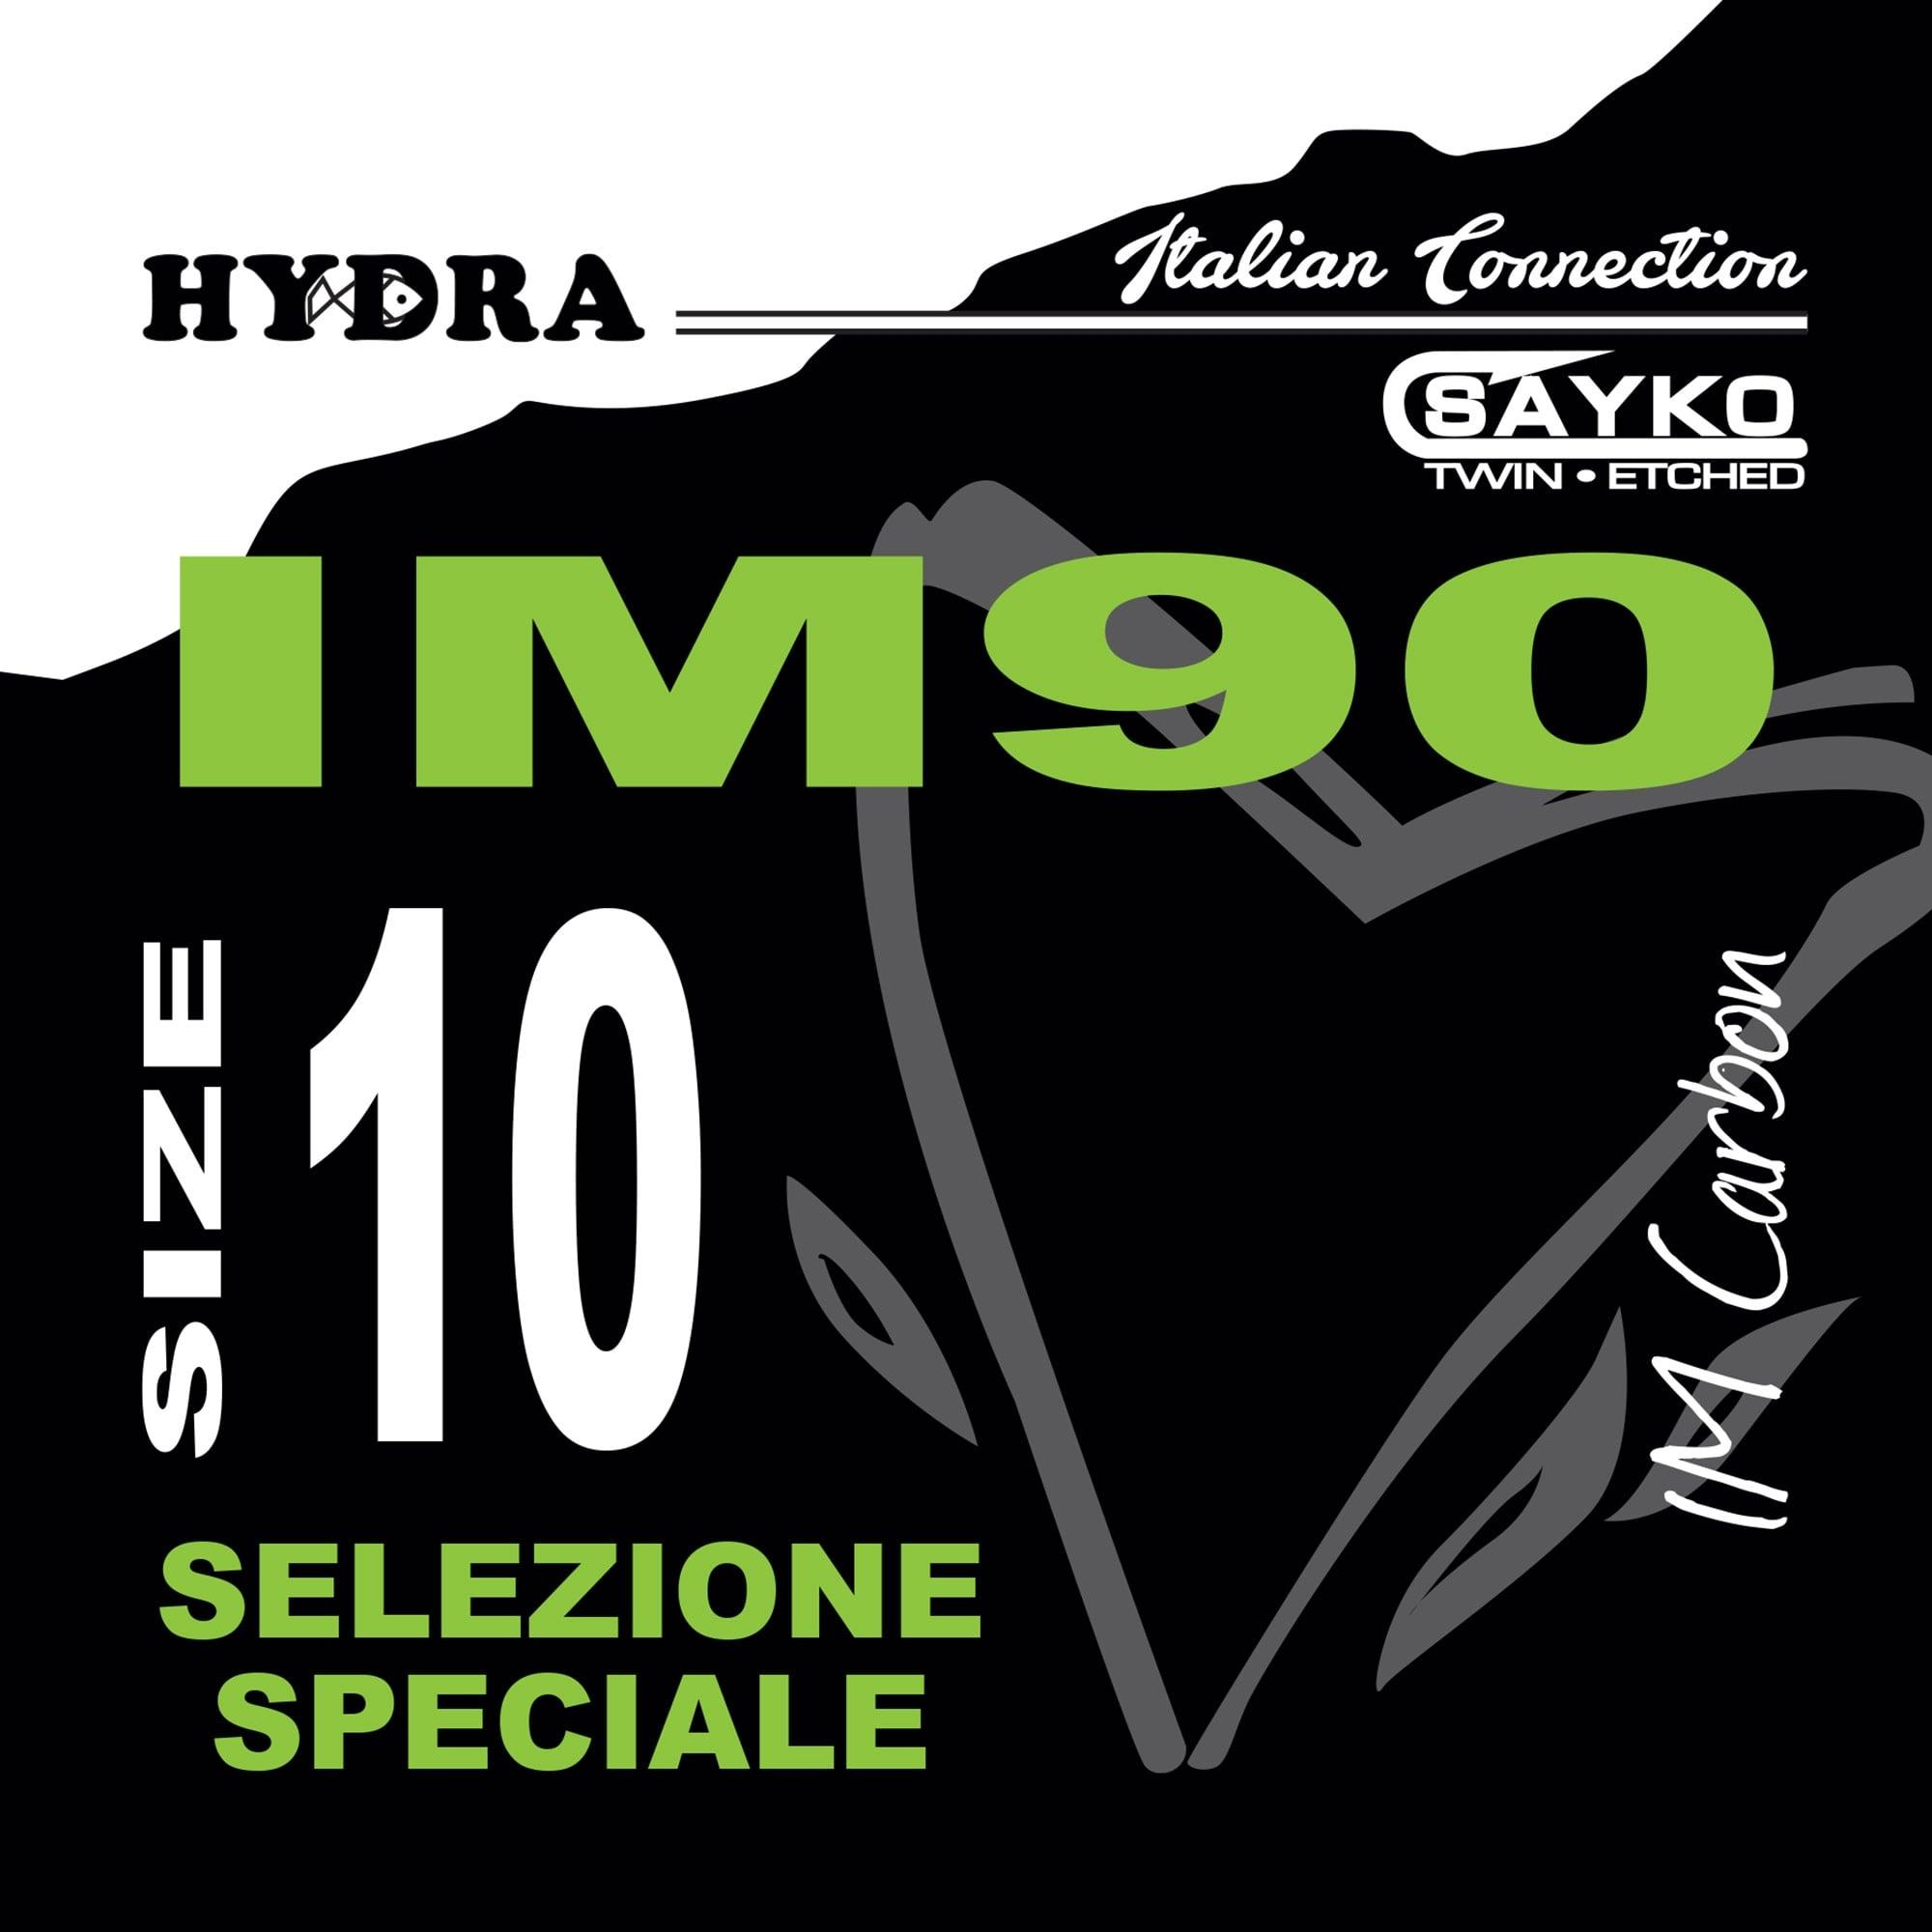 AMI HYDRA serie IM90 Nichelato (20pz)